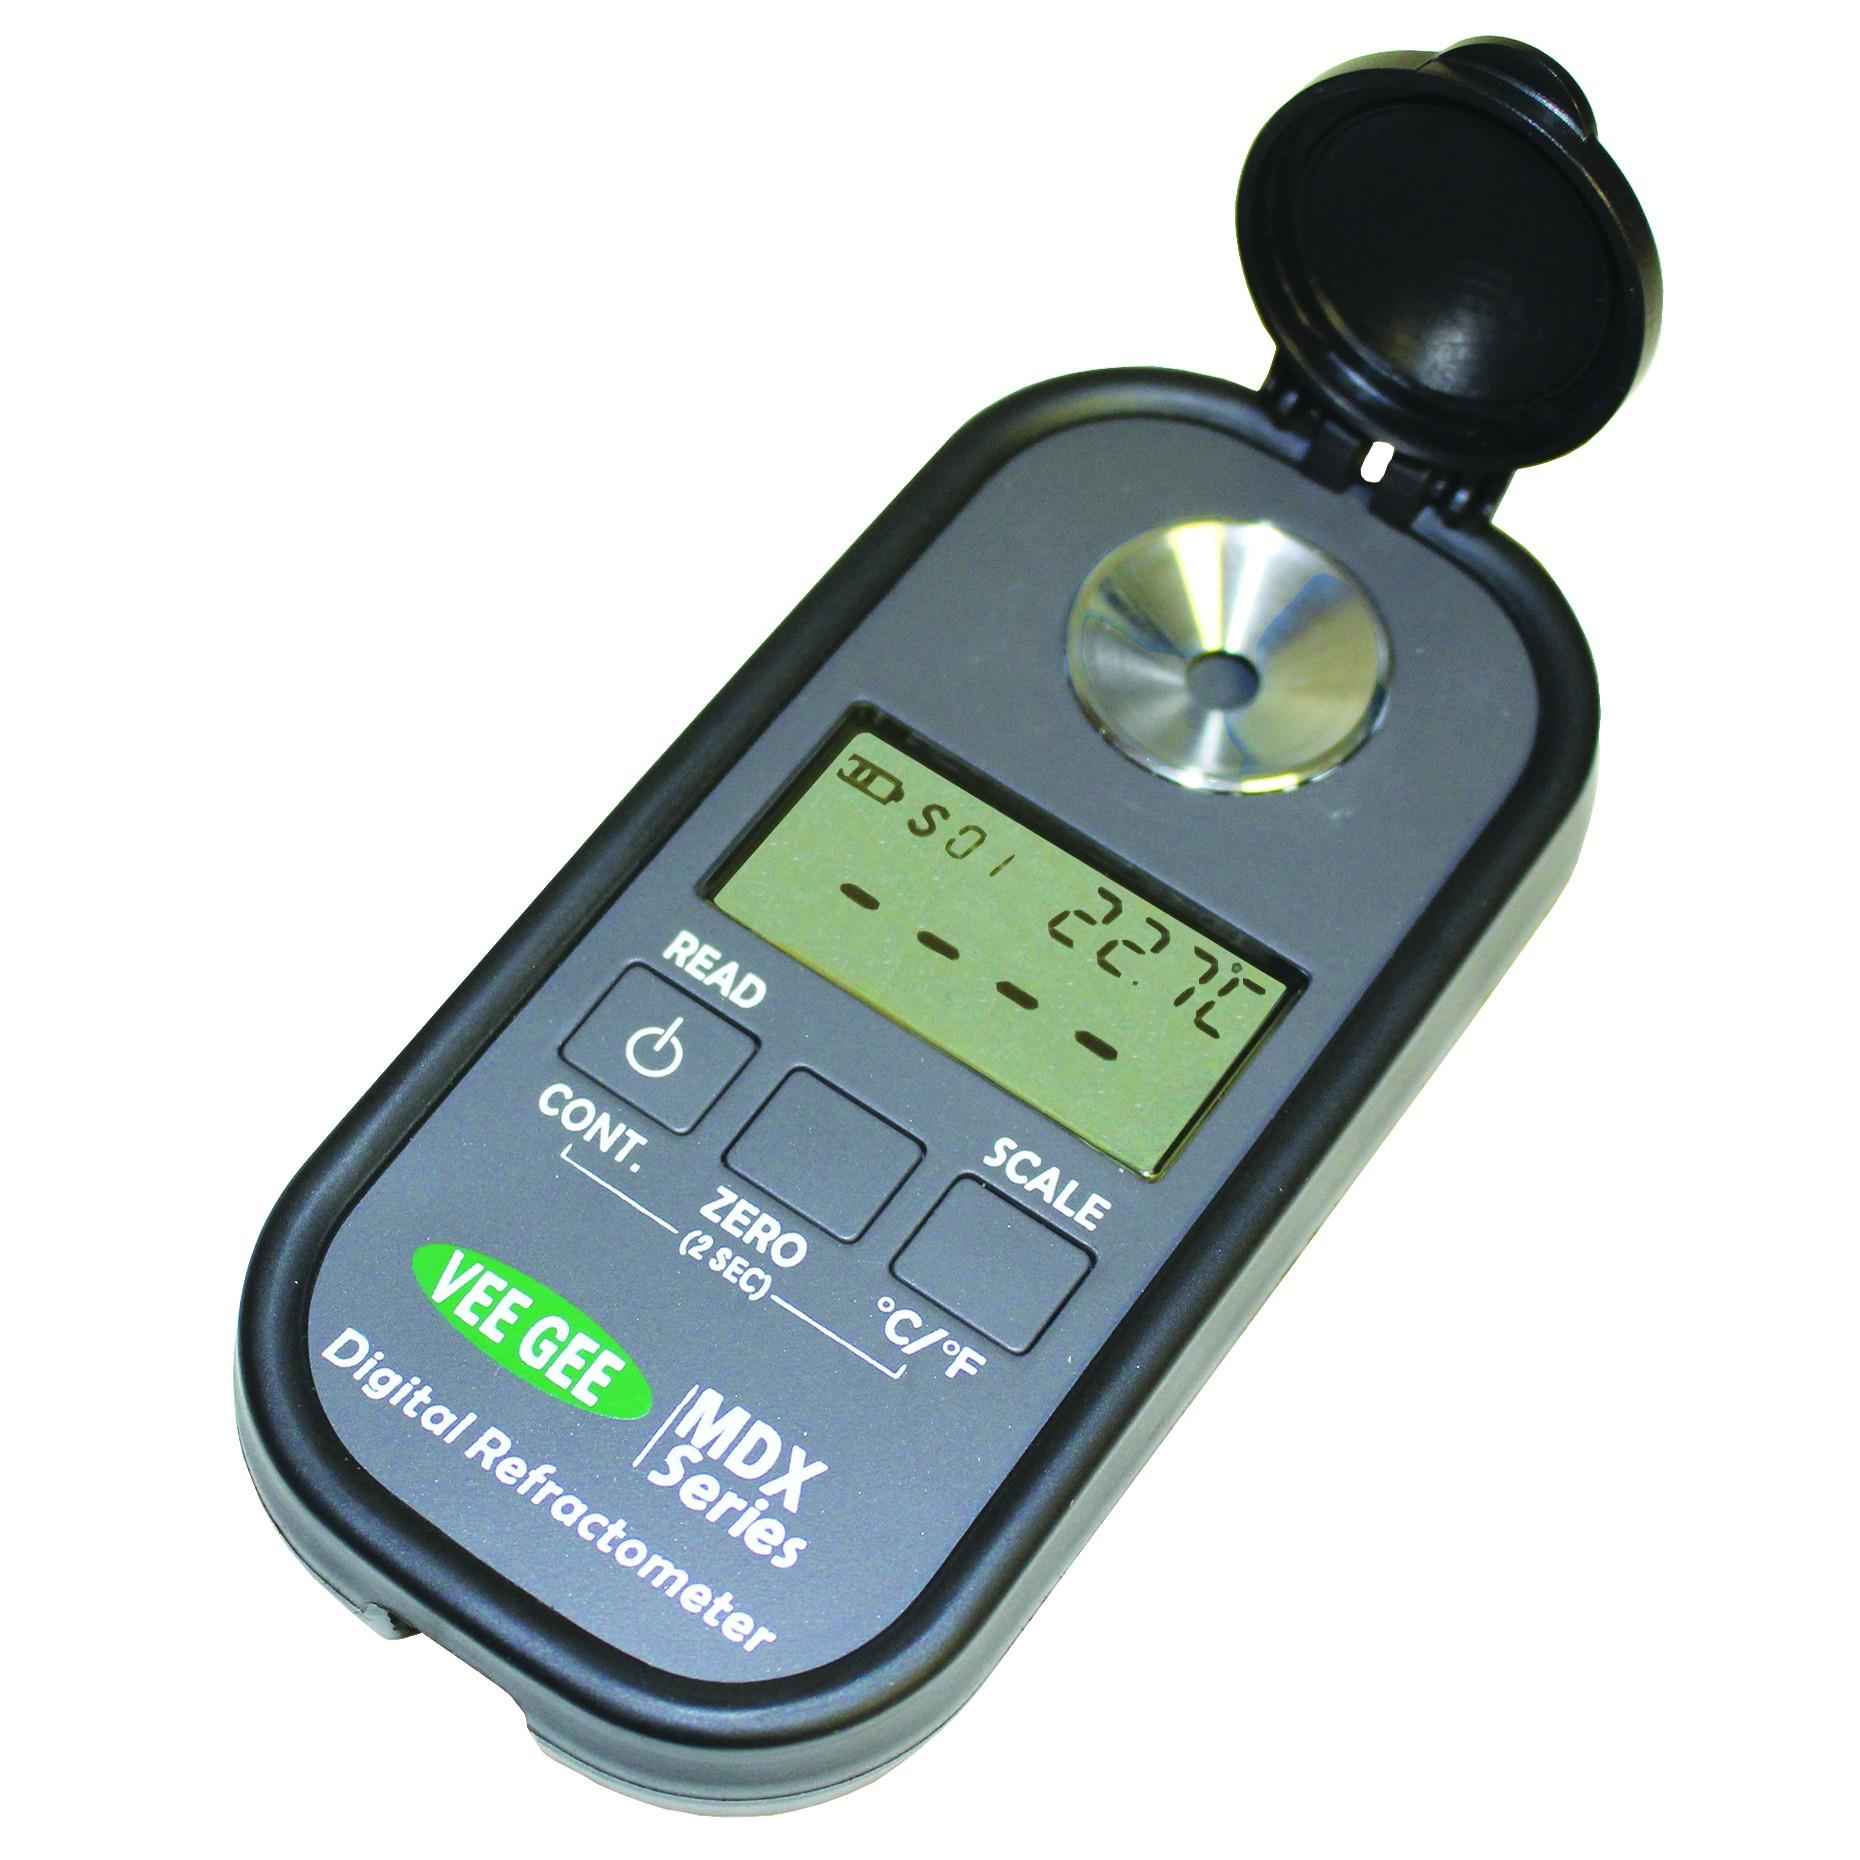 More Wine Refractometer Spreadsheet For 48102, Mdx102 Refractometer For: Nd, Brix Wide Range  Brix